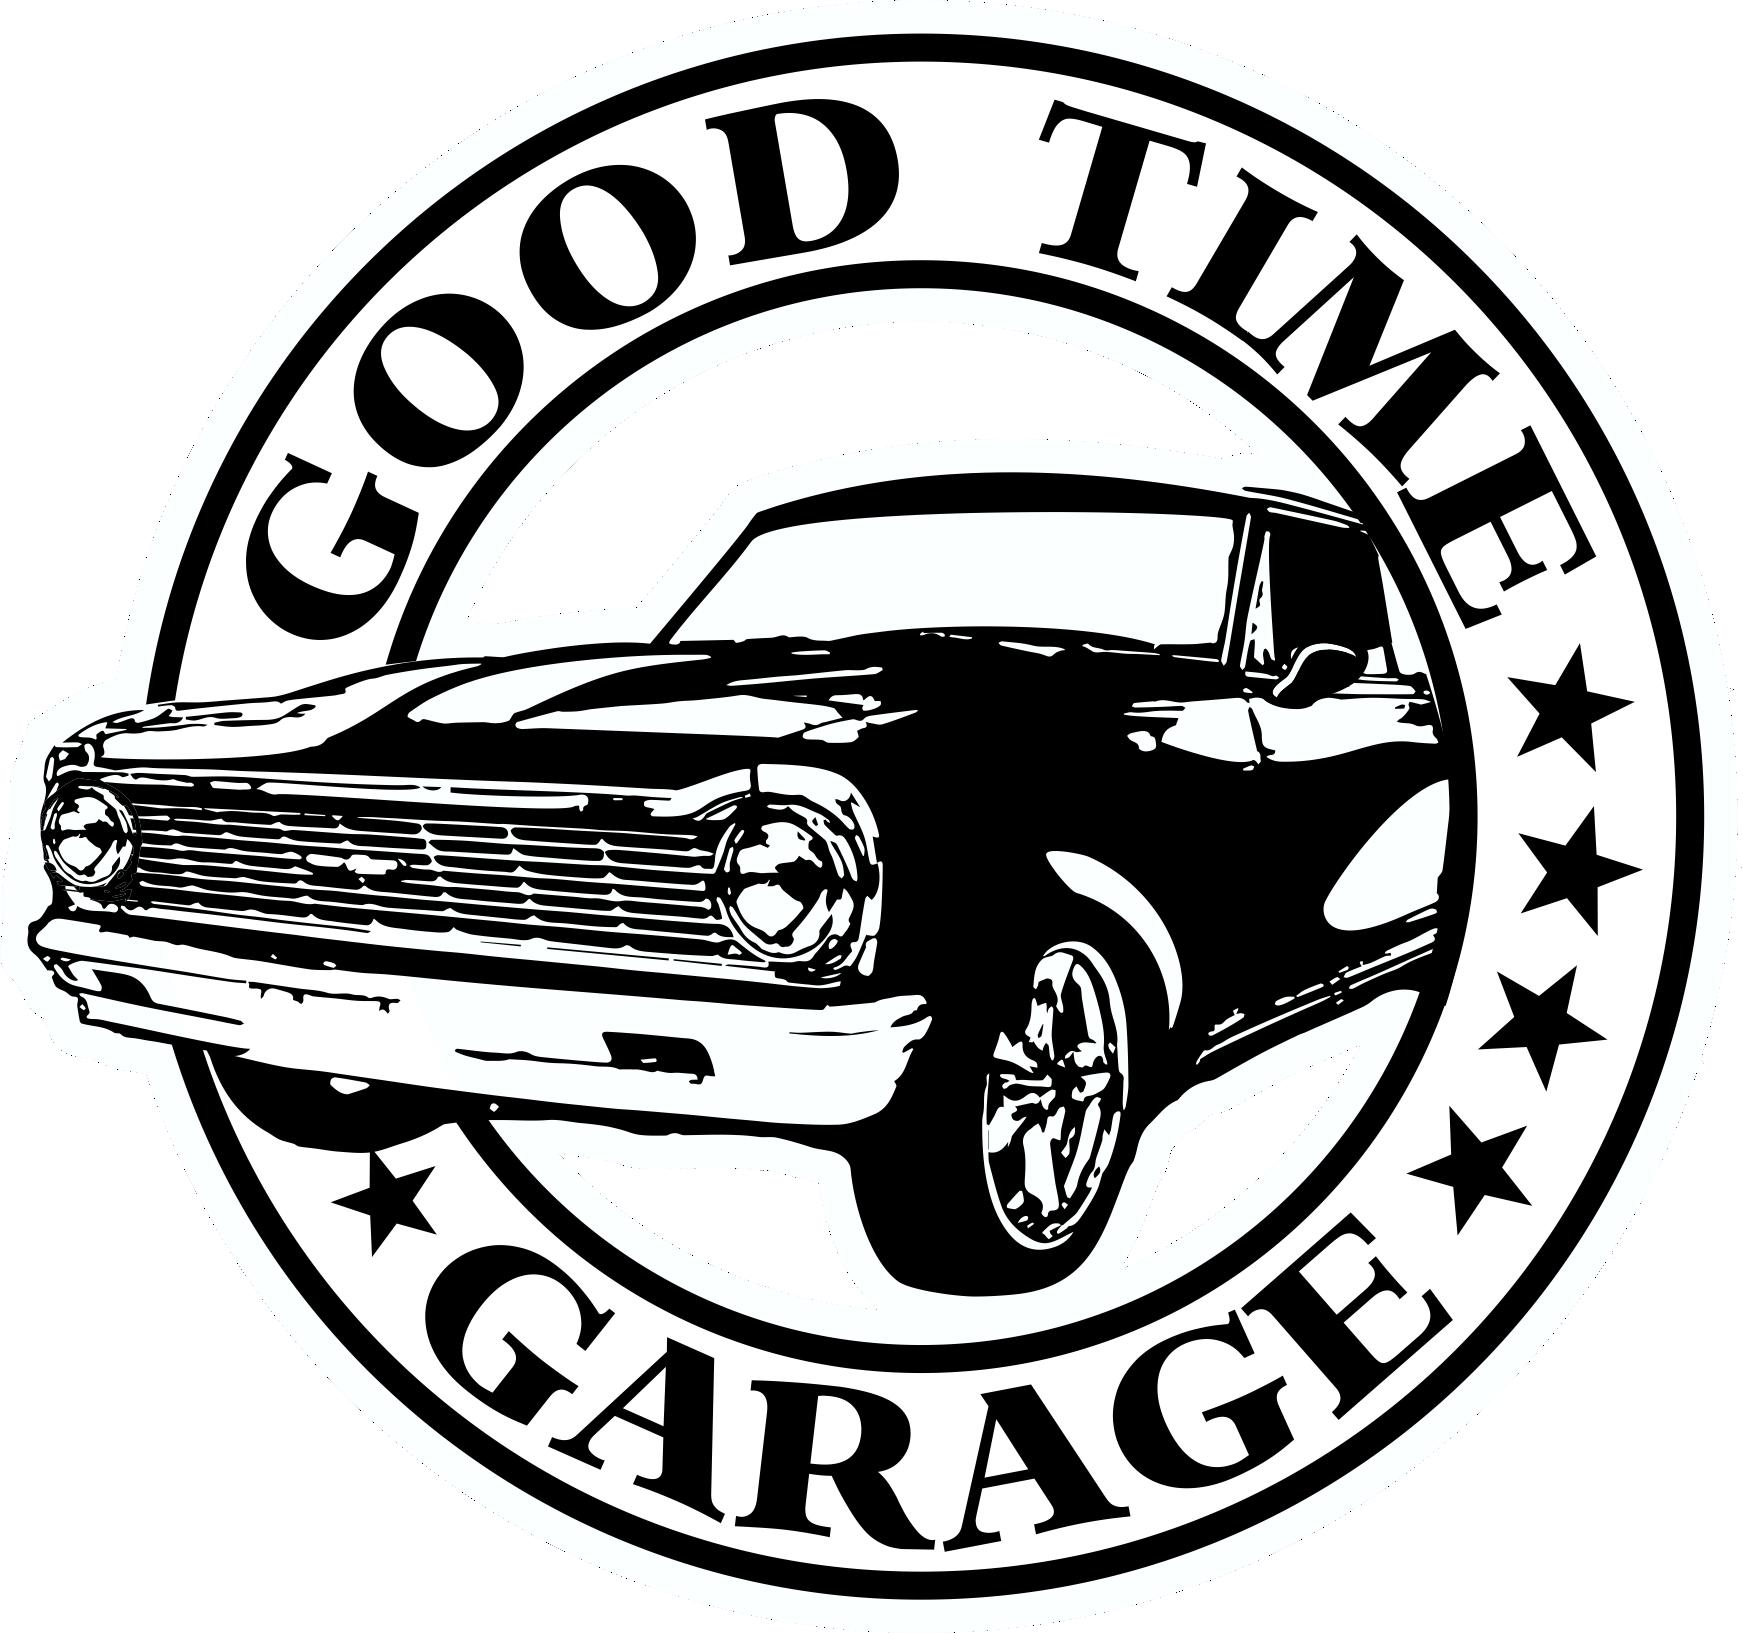 Car repair garage clipart image Good Time Garage   #GTGMoco   Classic Auto Repair Restoration image